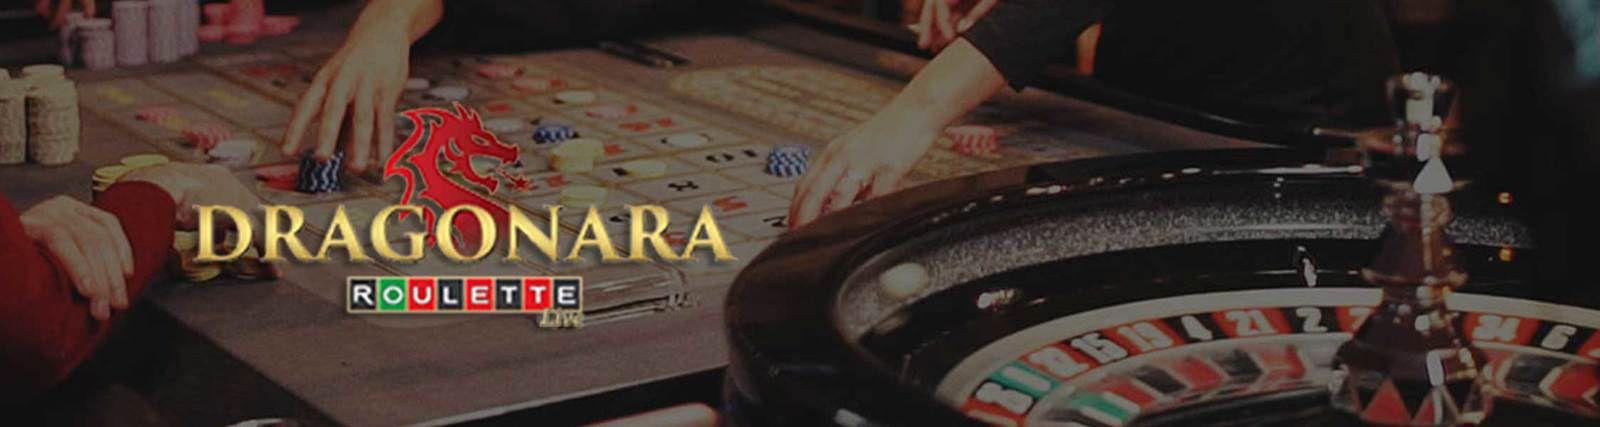 roulette en ligne live Evolution Gaming en direct du Dragonara Casino de Malte